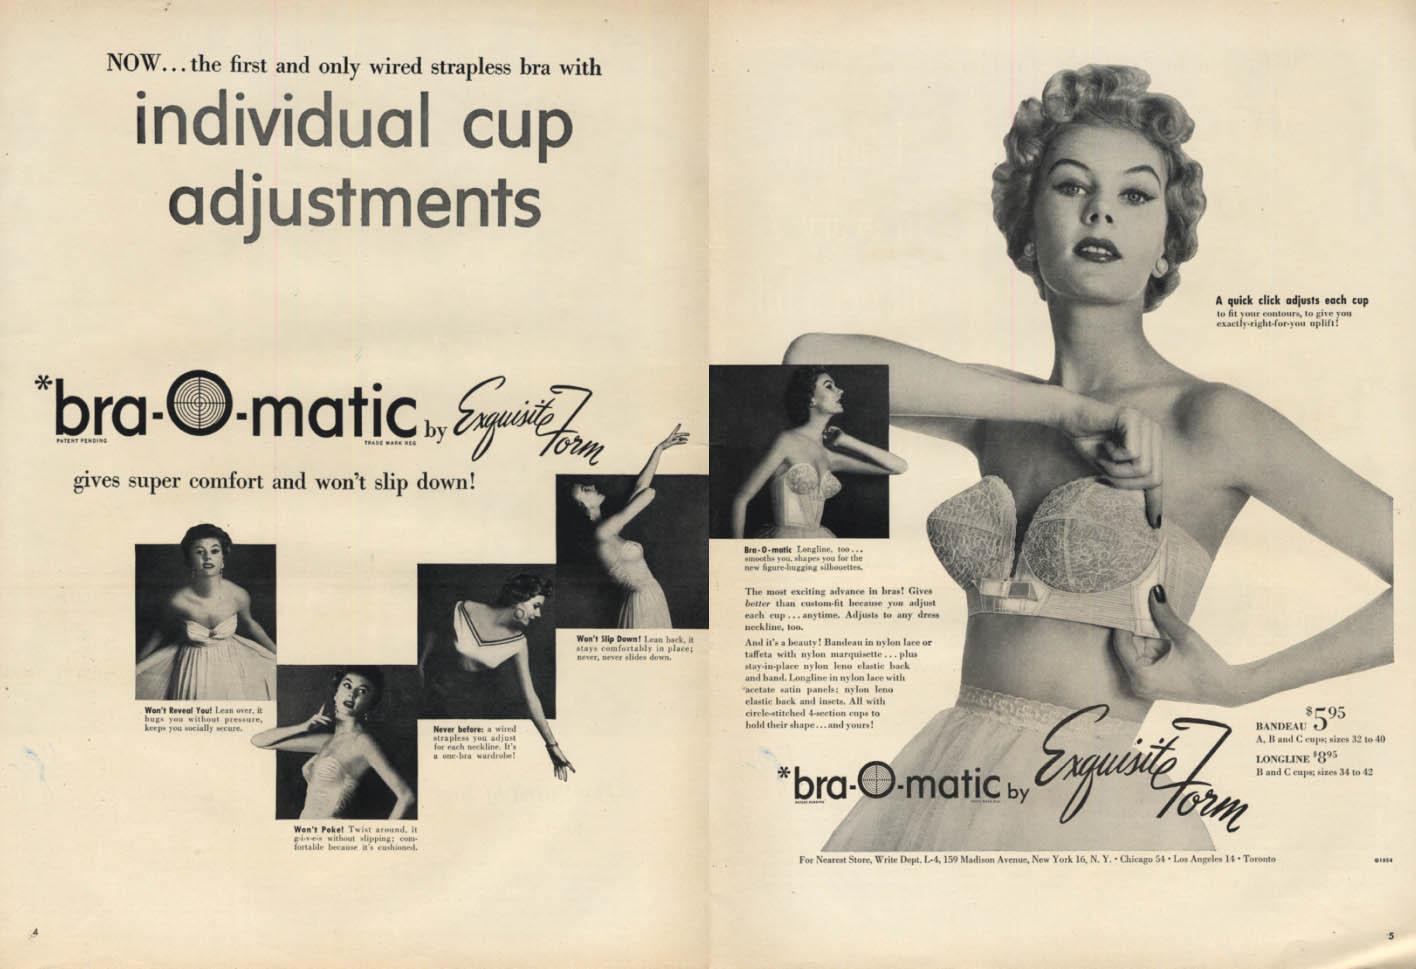 Bra-O-Matic Individual Cup Adjustments - Exquisite Form Bra ad 1954 L